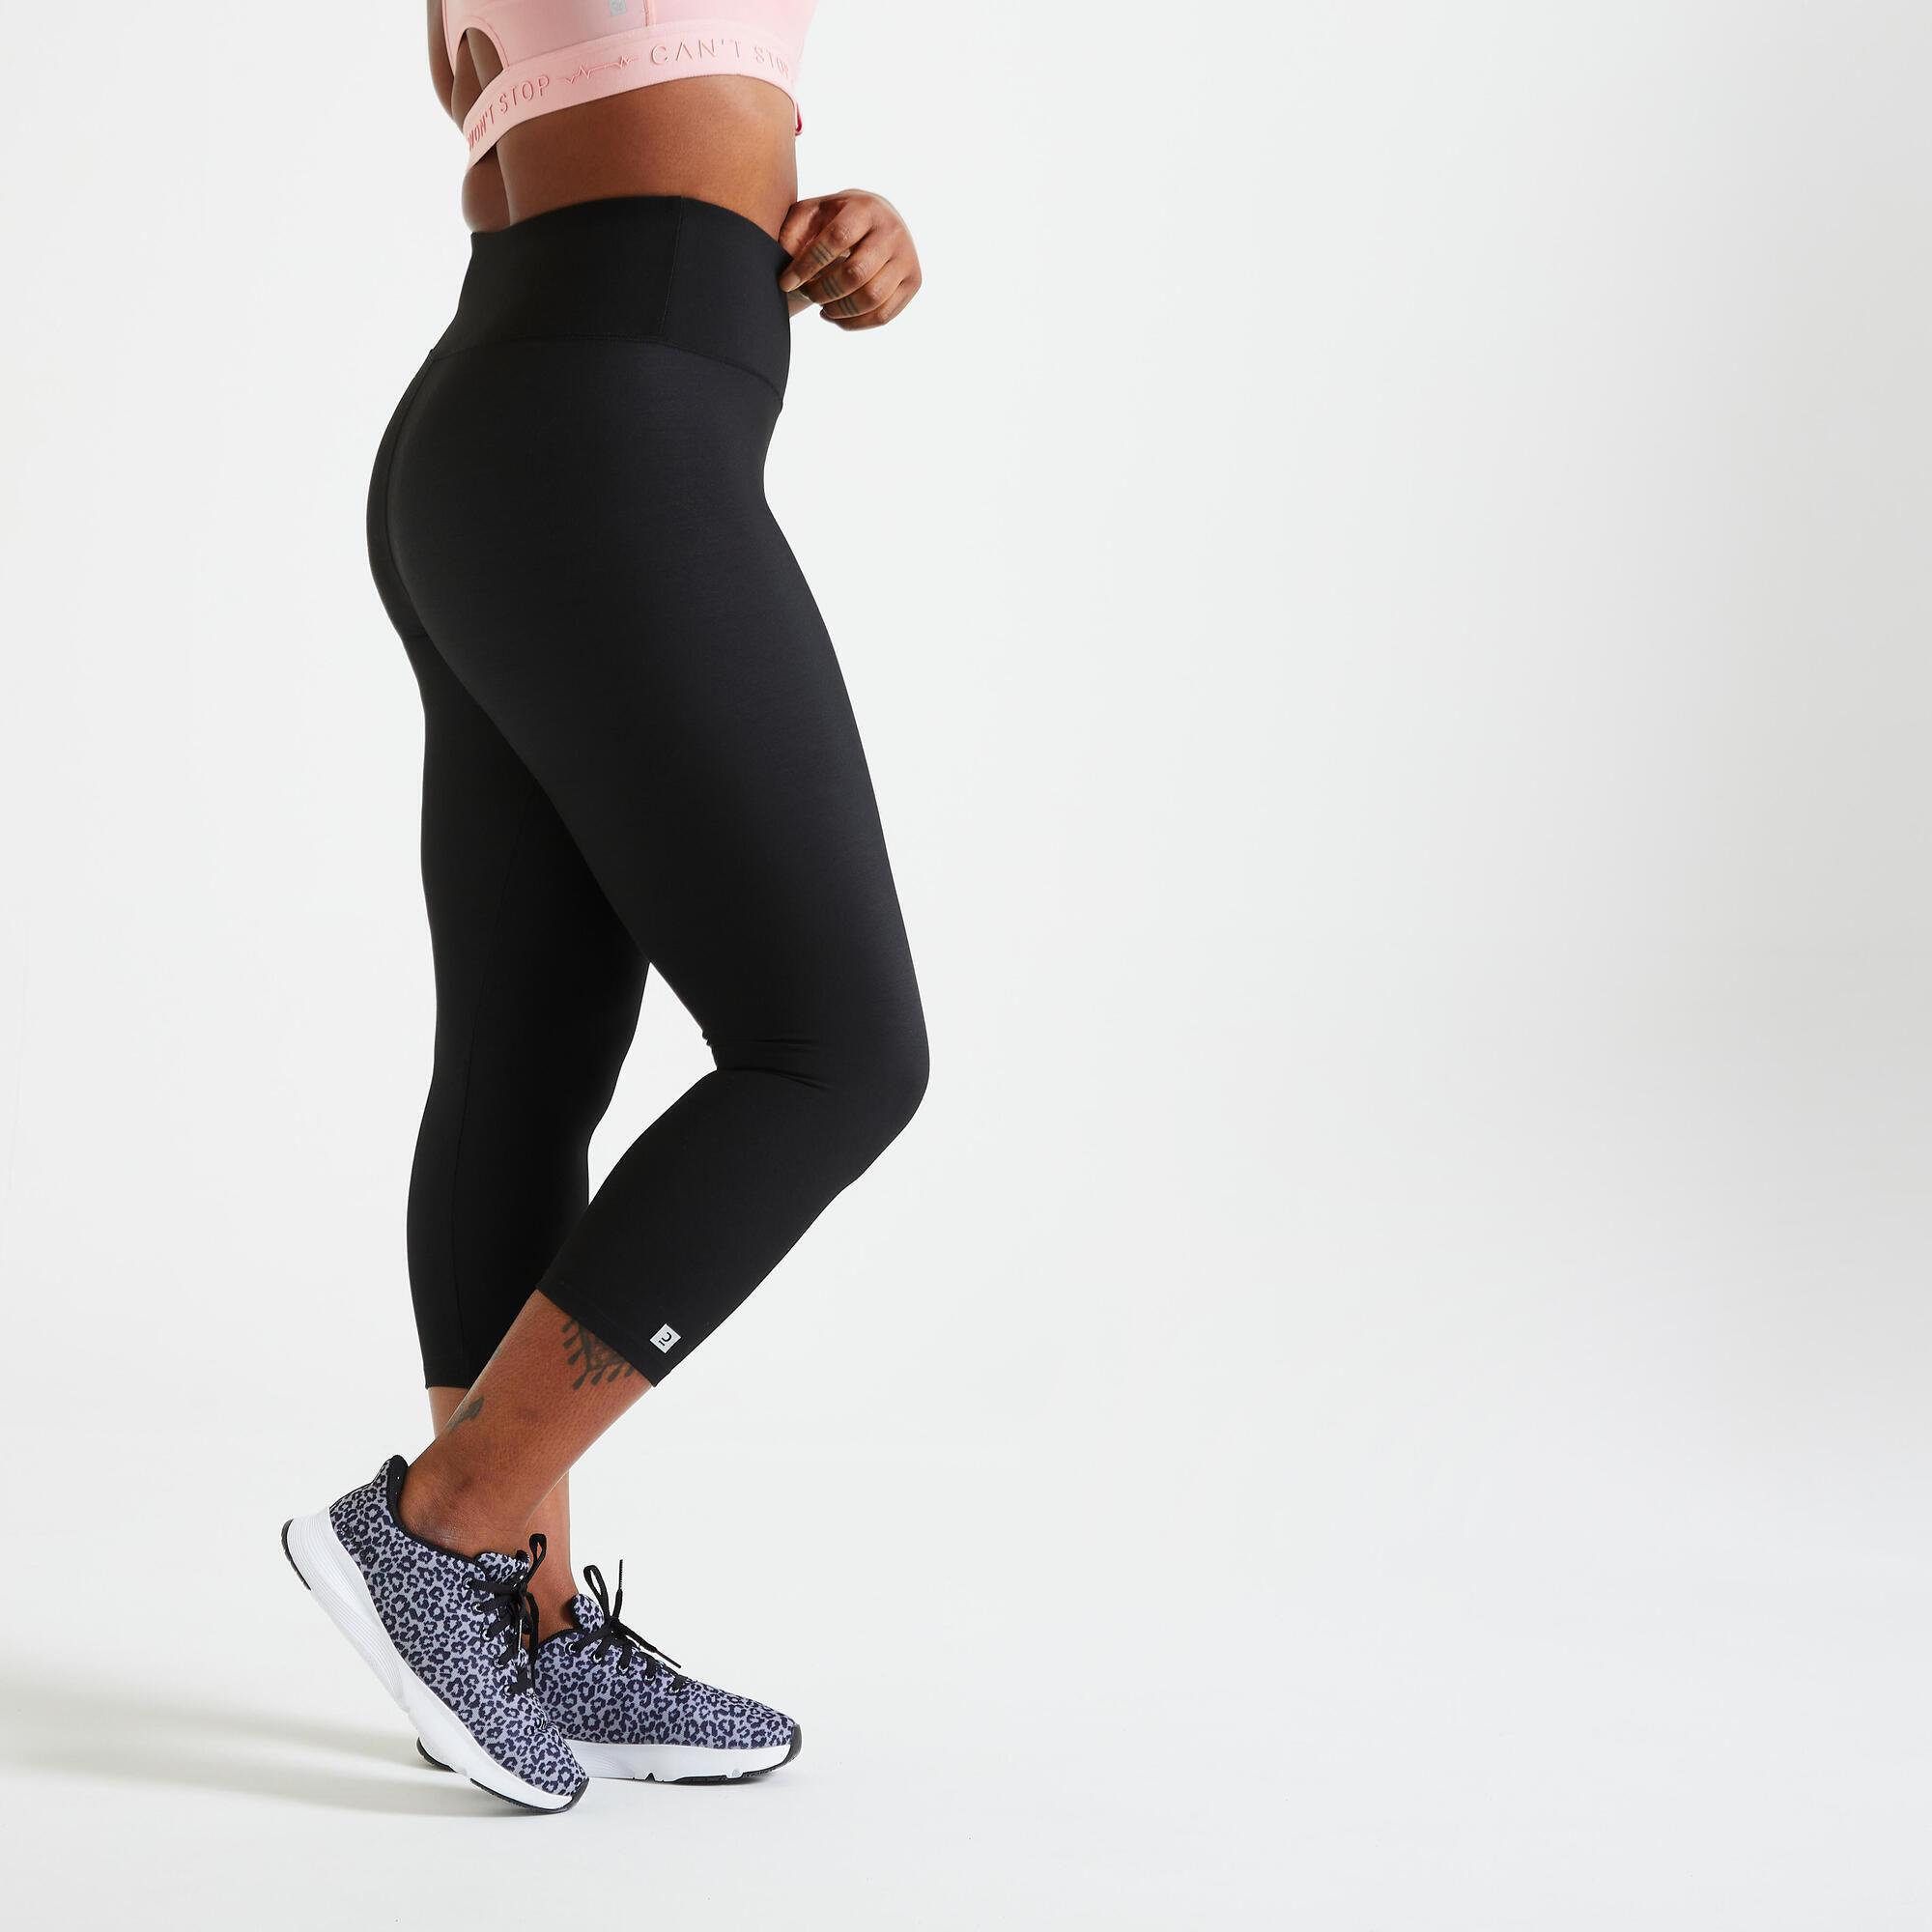 Legginsy fitness damskie Domyos krótkie